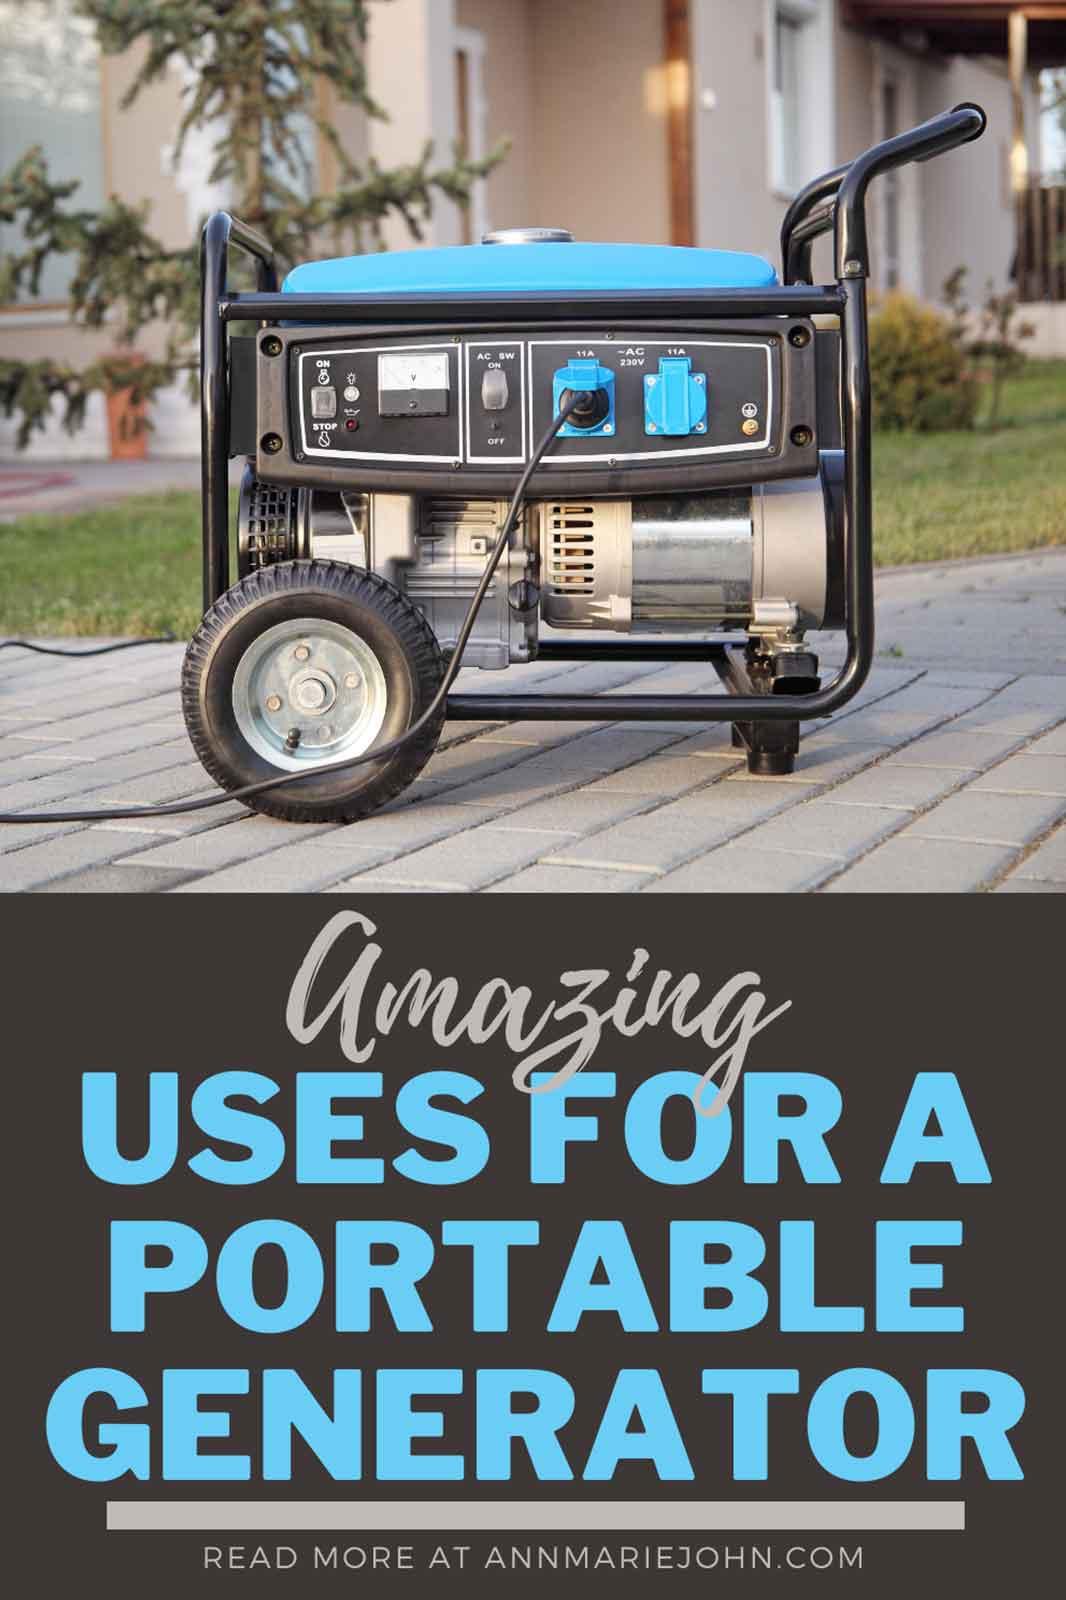 Amazing Uses for Portable Generators